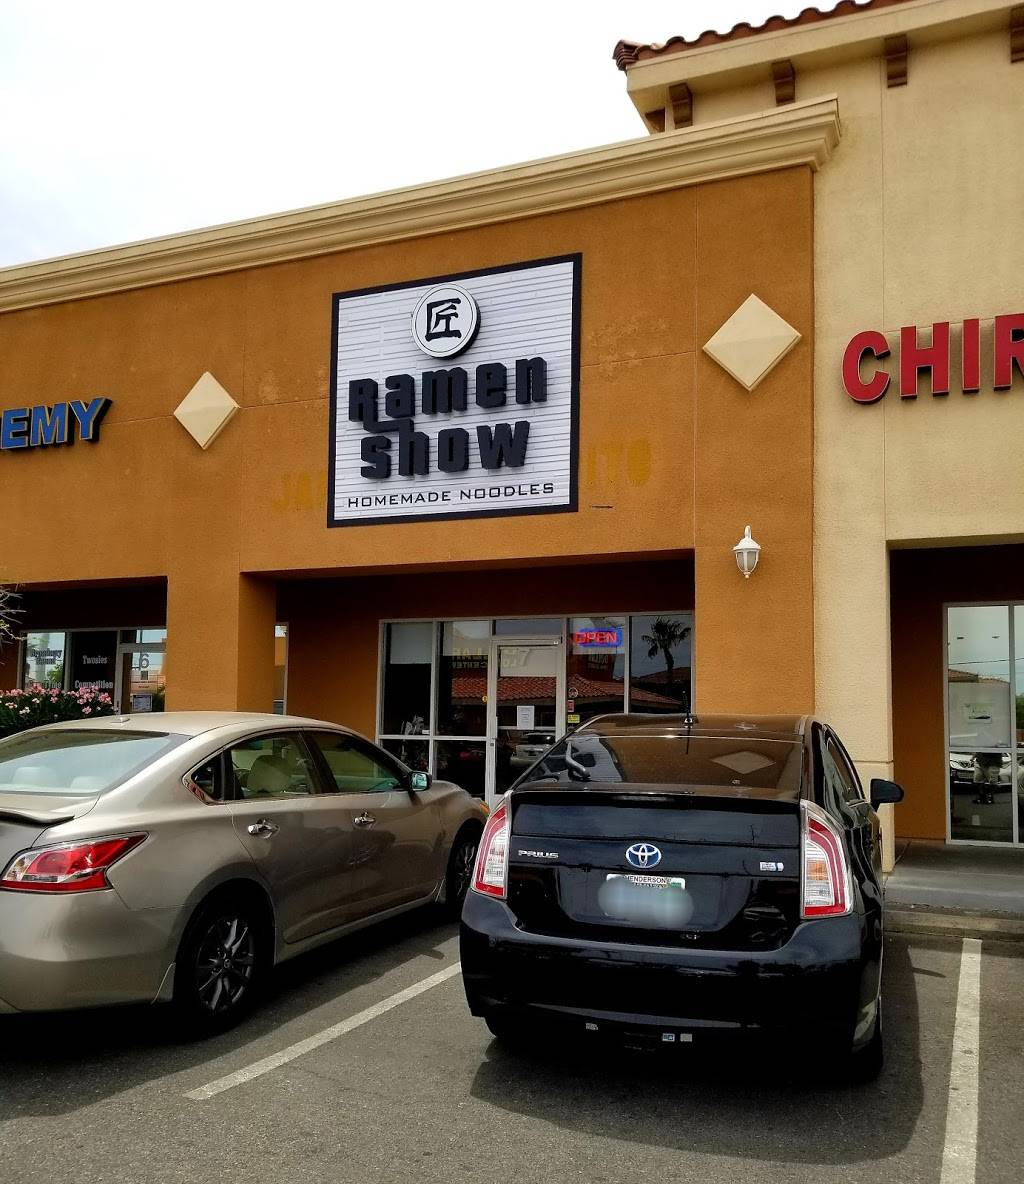 Ramen Show   restaurant   7835 S Rainbow Blvd Suite #7, Las Vegas, NV 89139, USA   7024626723 OR +1 702-462-6723